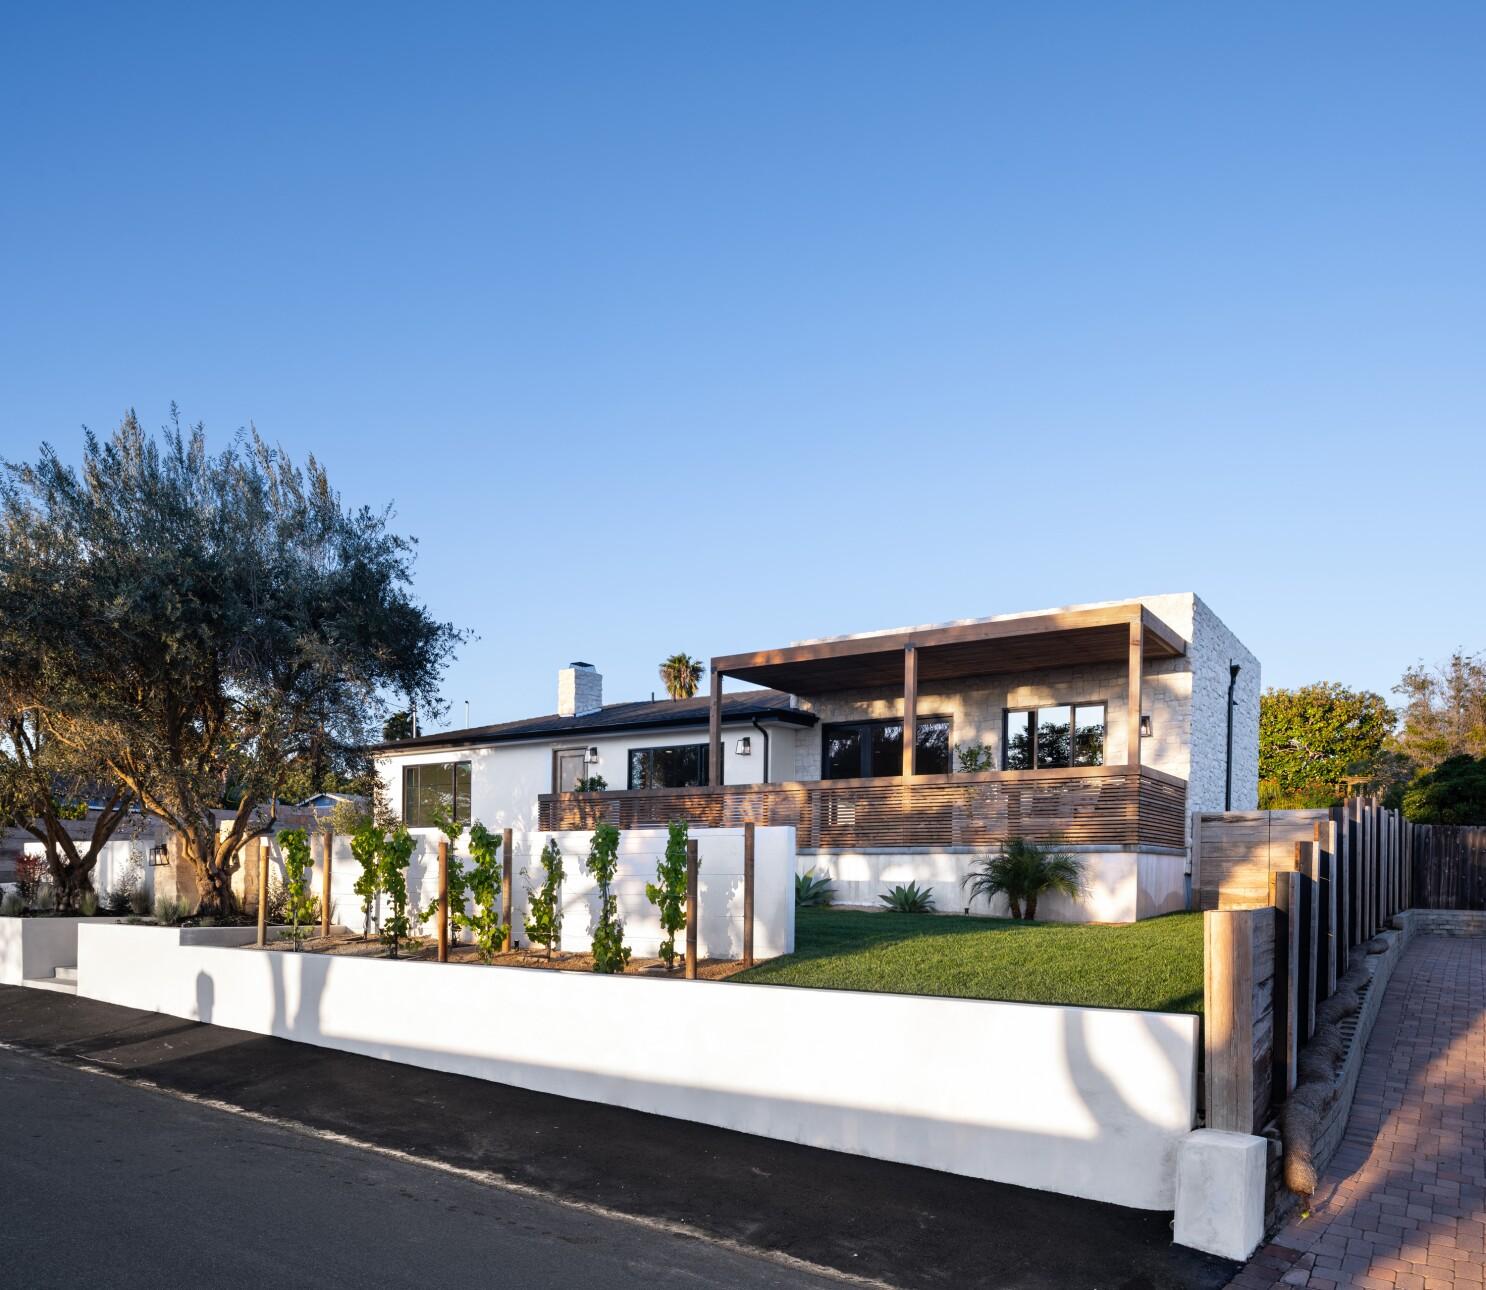 Remodel Turns Sedate Carlsbad Home Into View Rich Mini Villa The San Diego Union Tribune